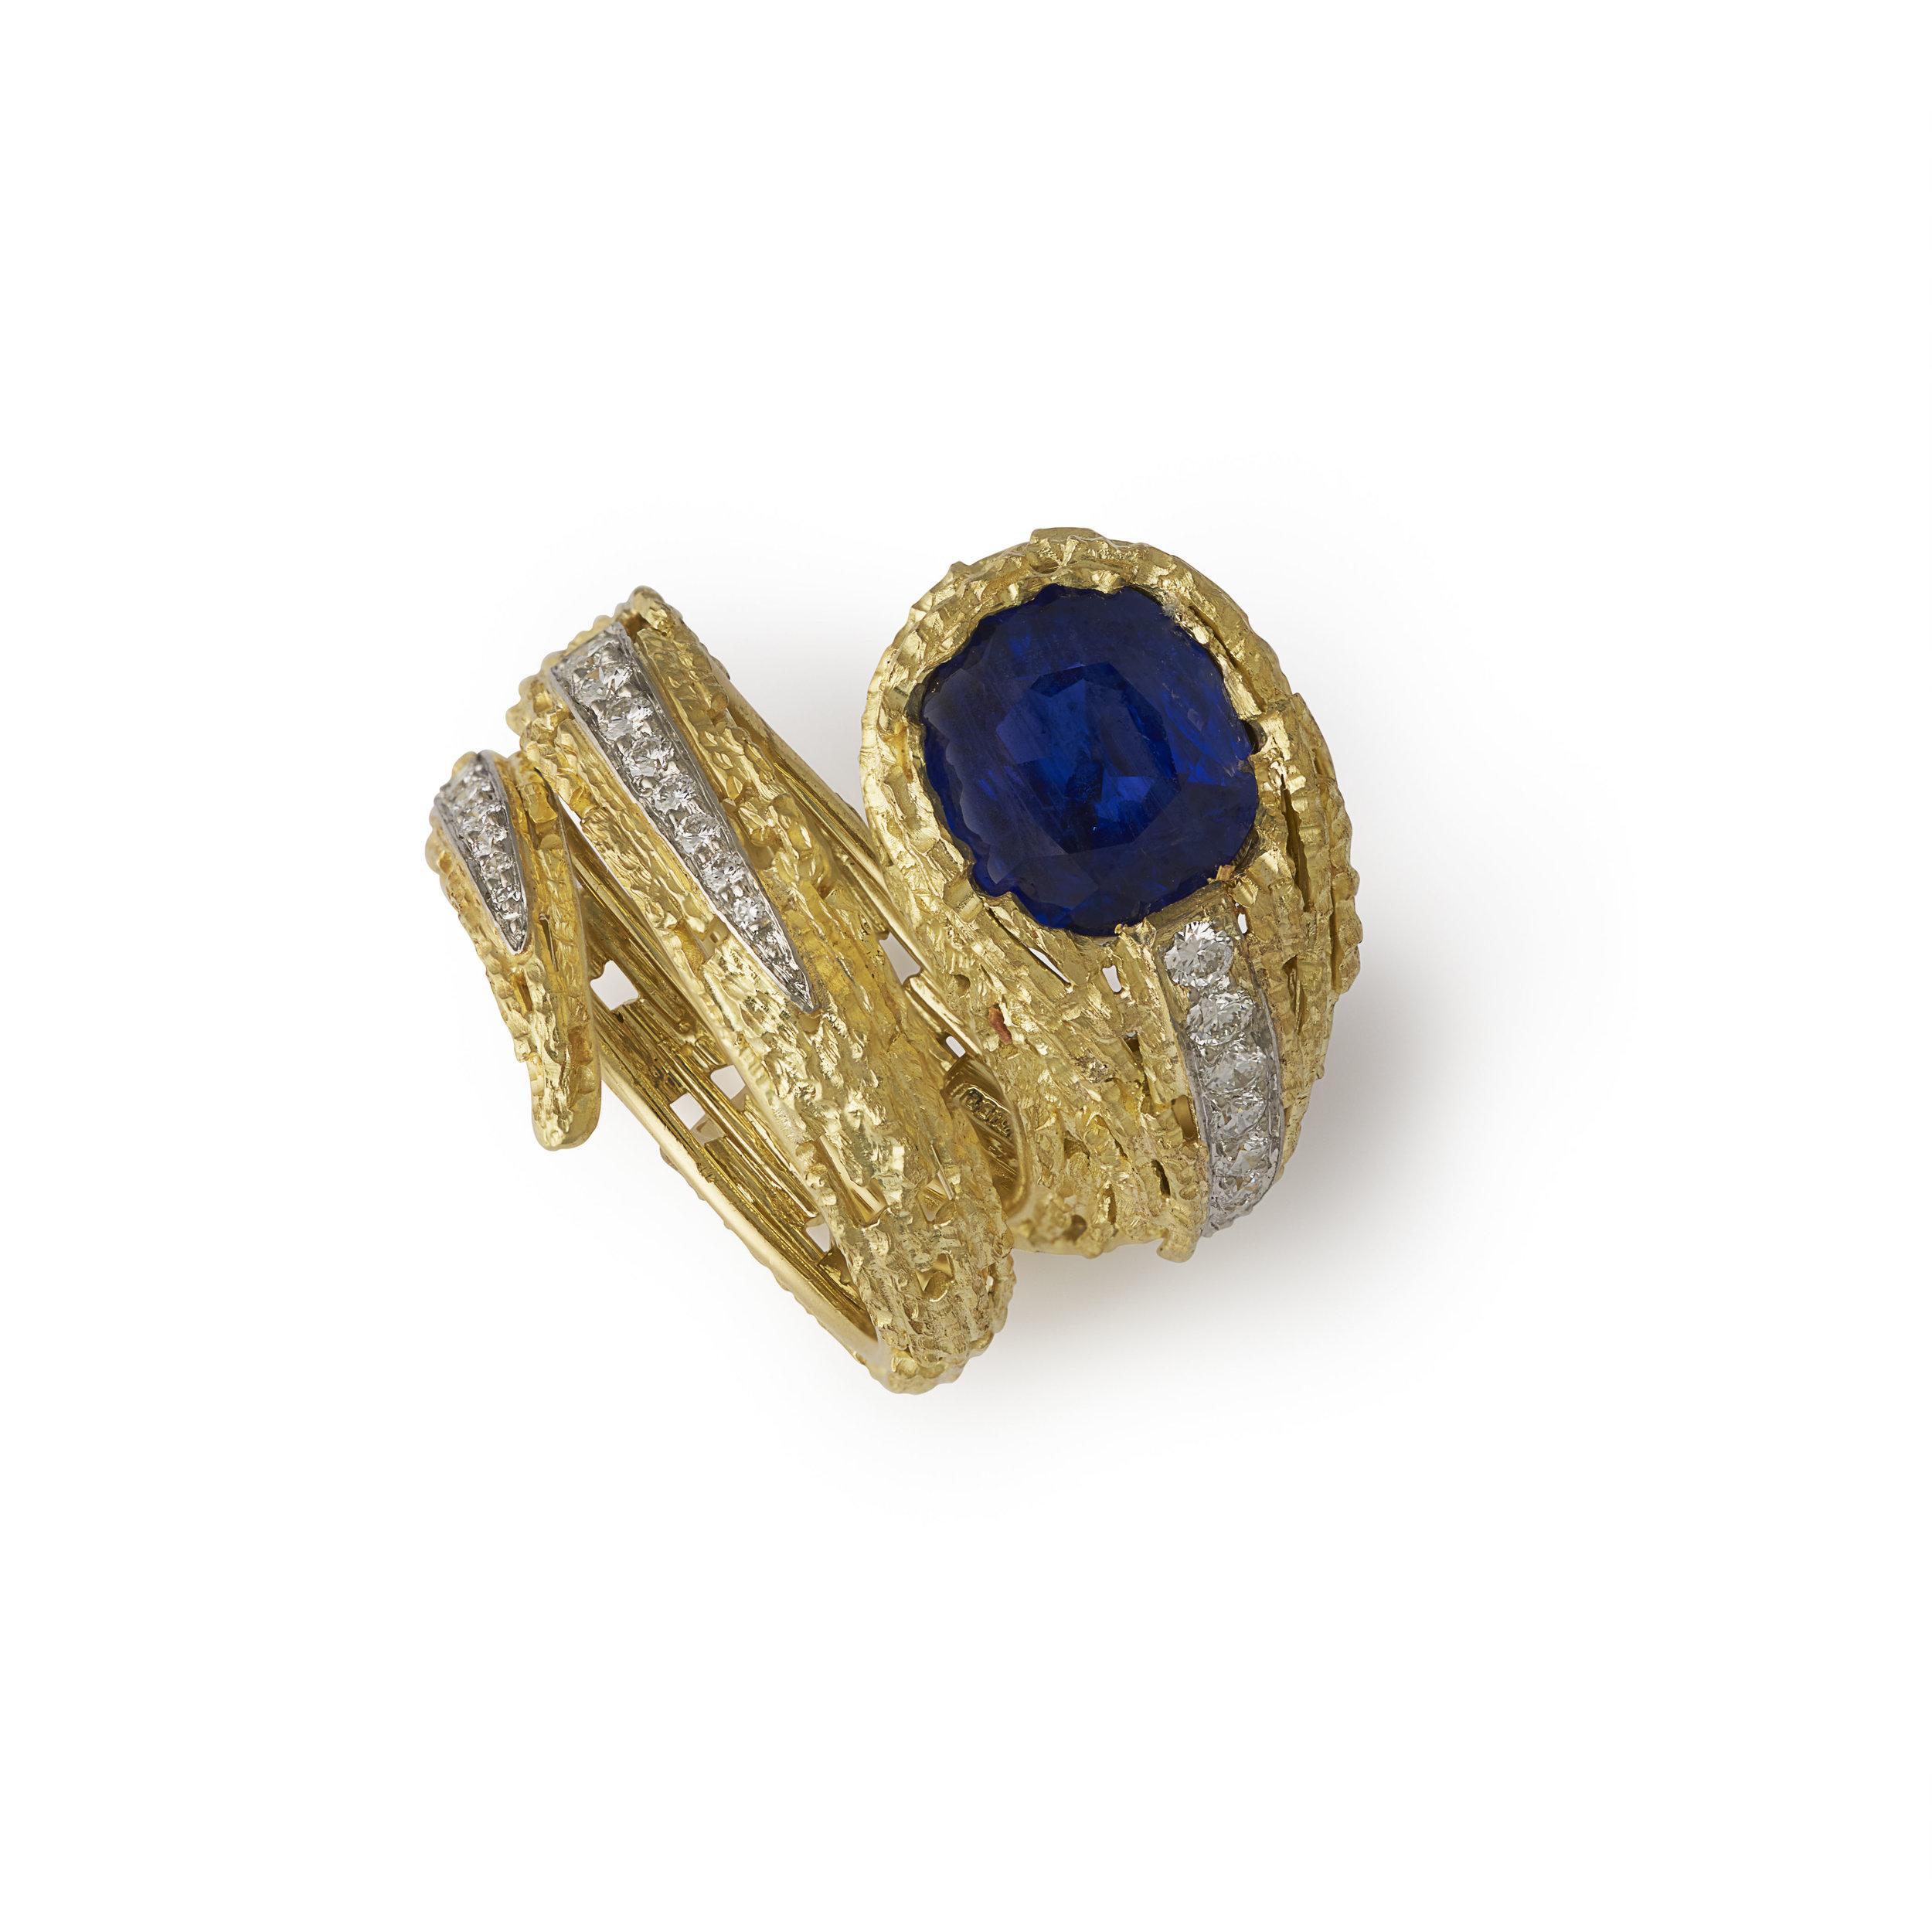 A17729 Grima Jewellers Ltd13271.jpg